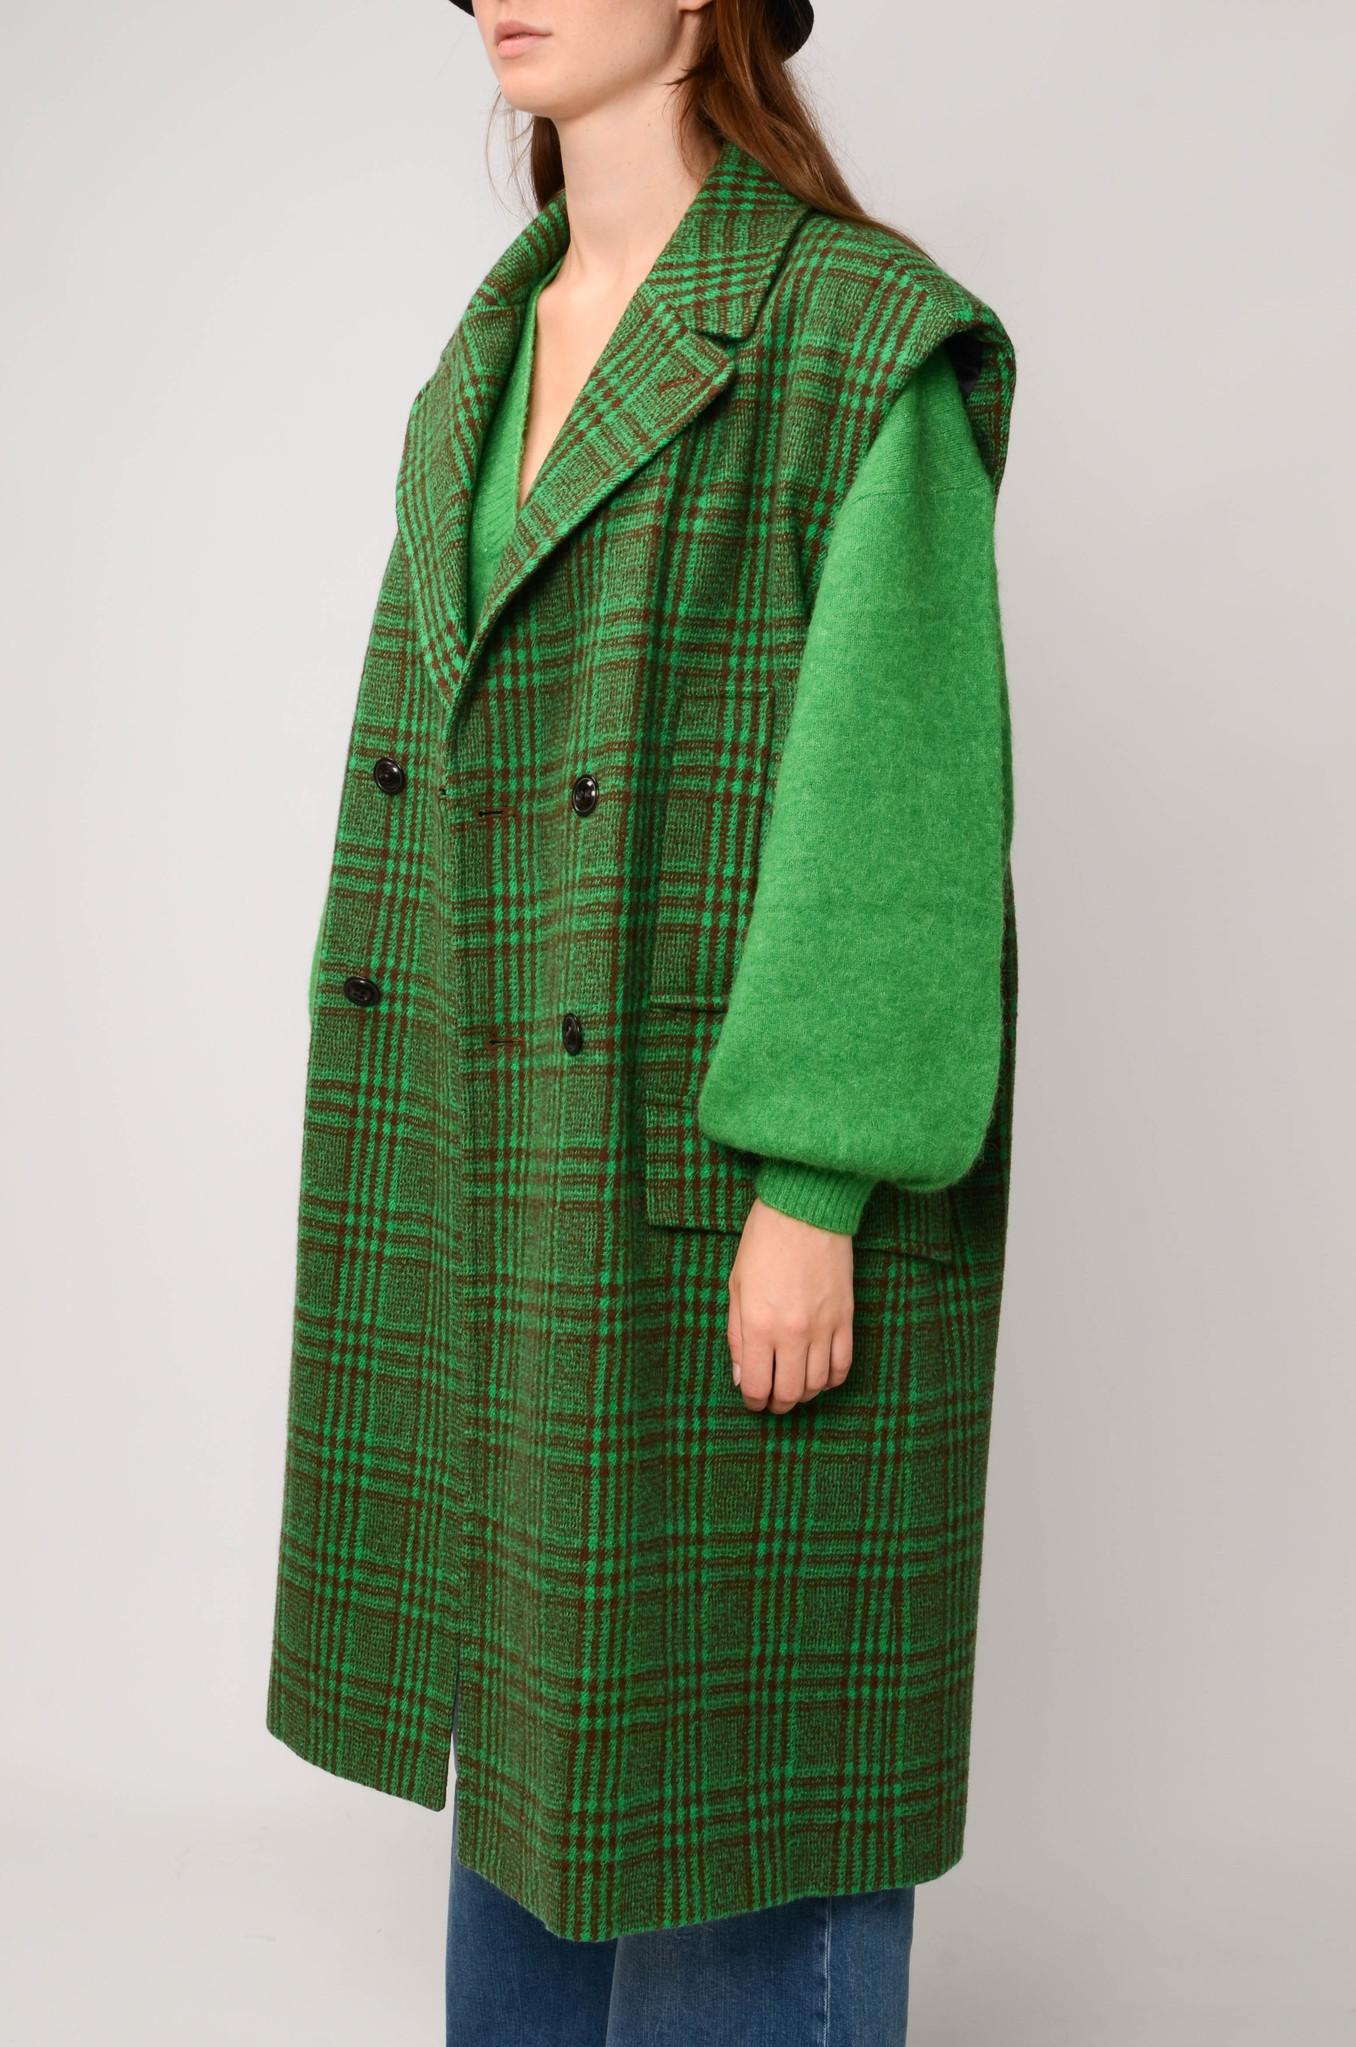 DECKA COAT IN GREEN CHECK-3